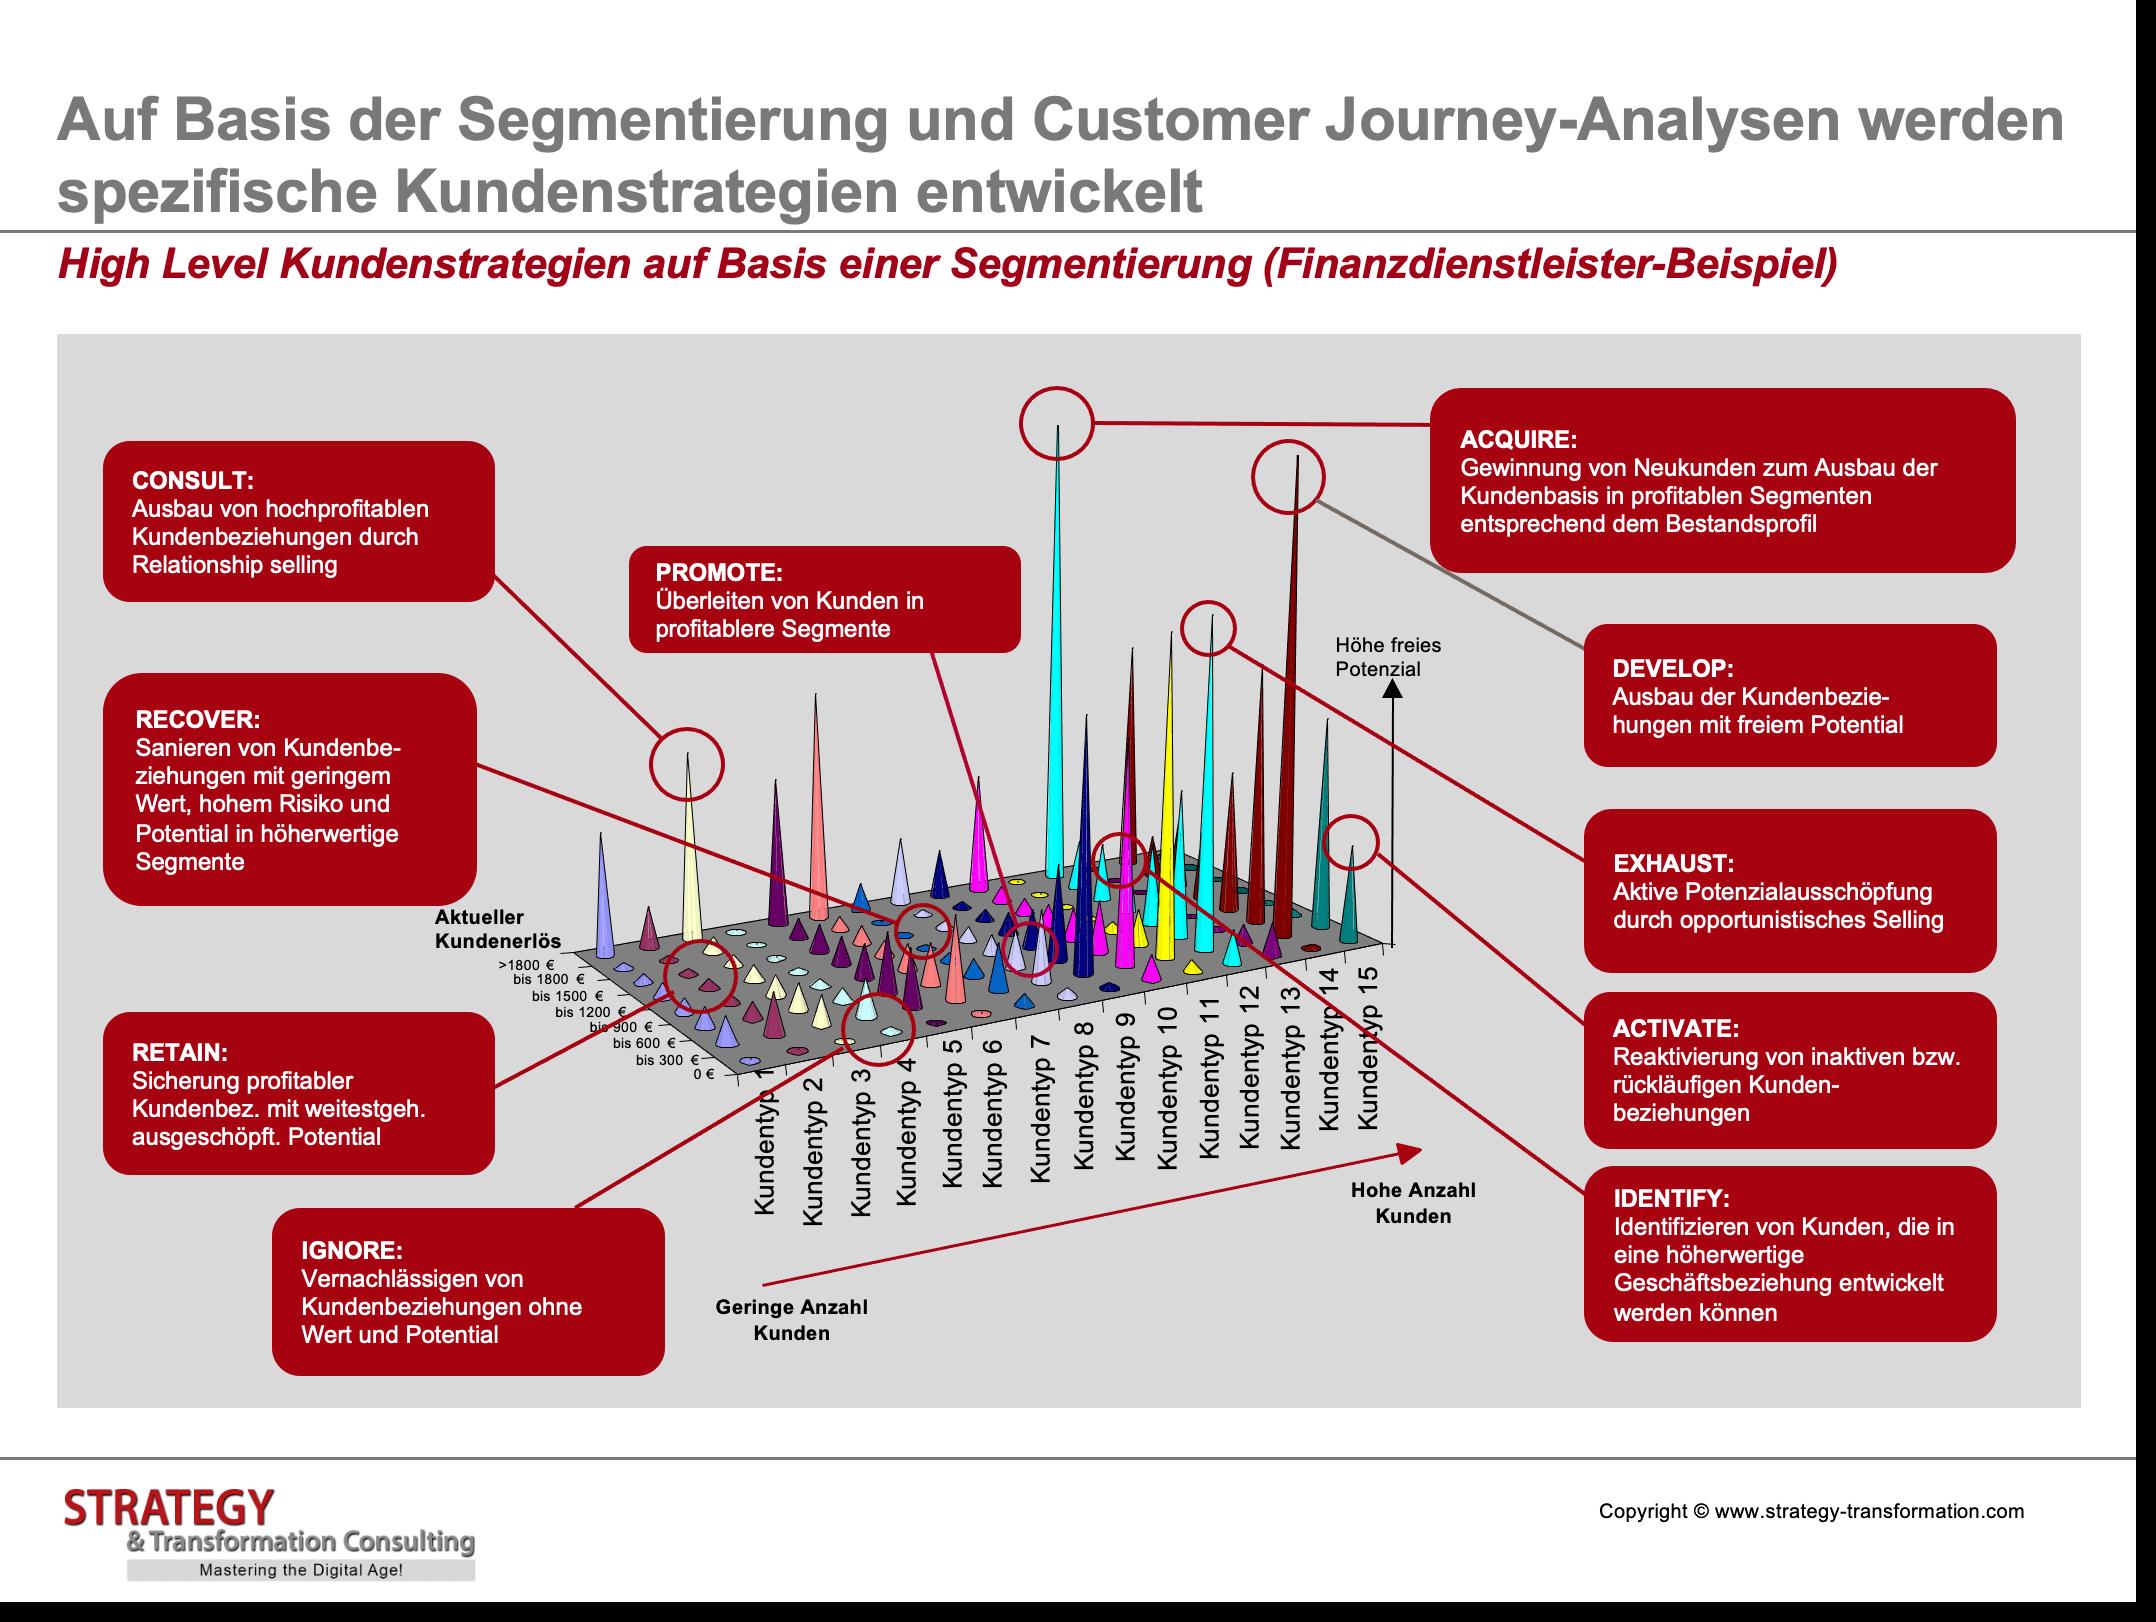 Customer Experience Management_High Level Kundenstrategien